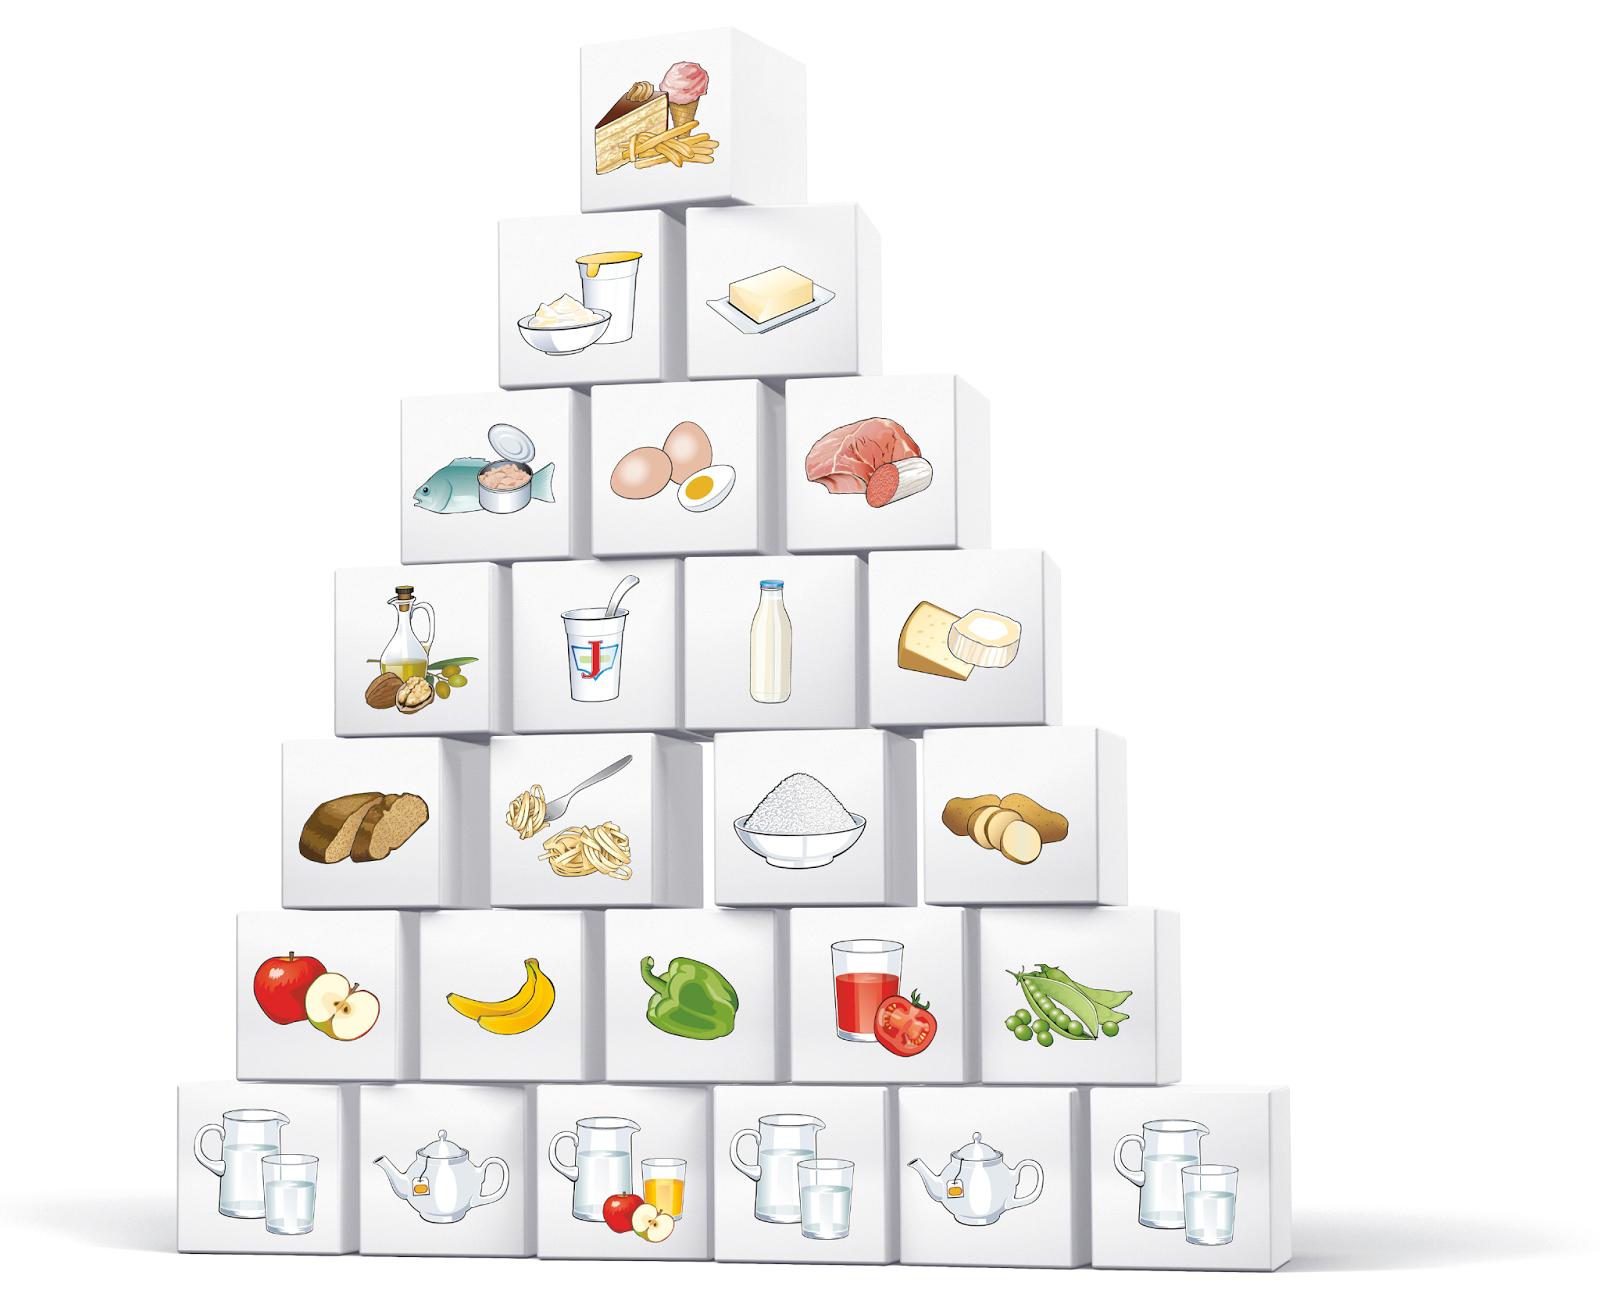 Ernahrungspyramide basteln